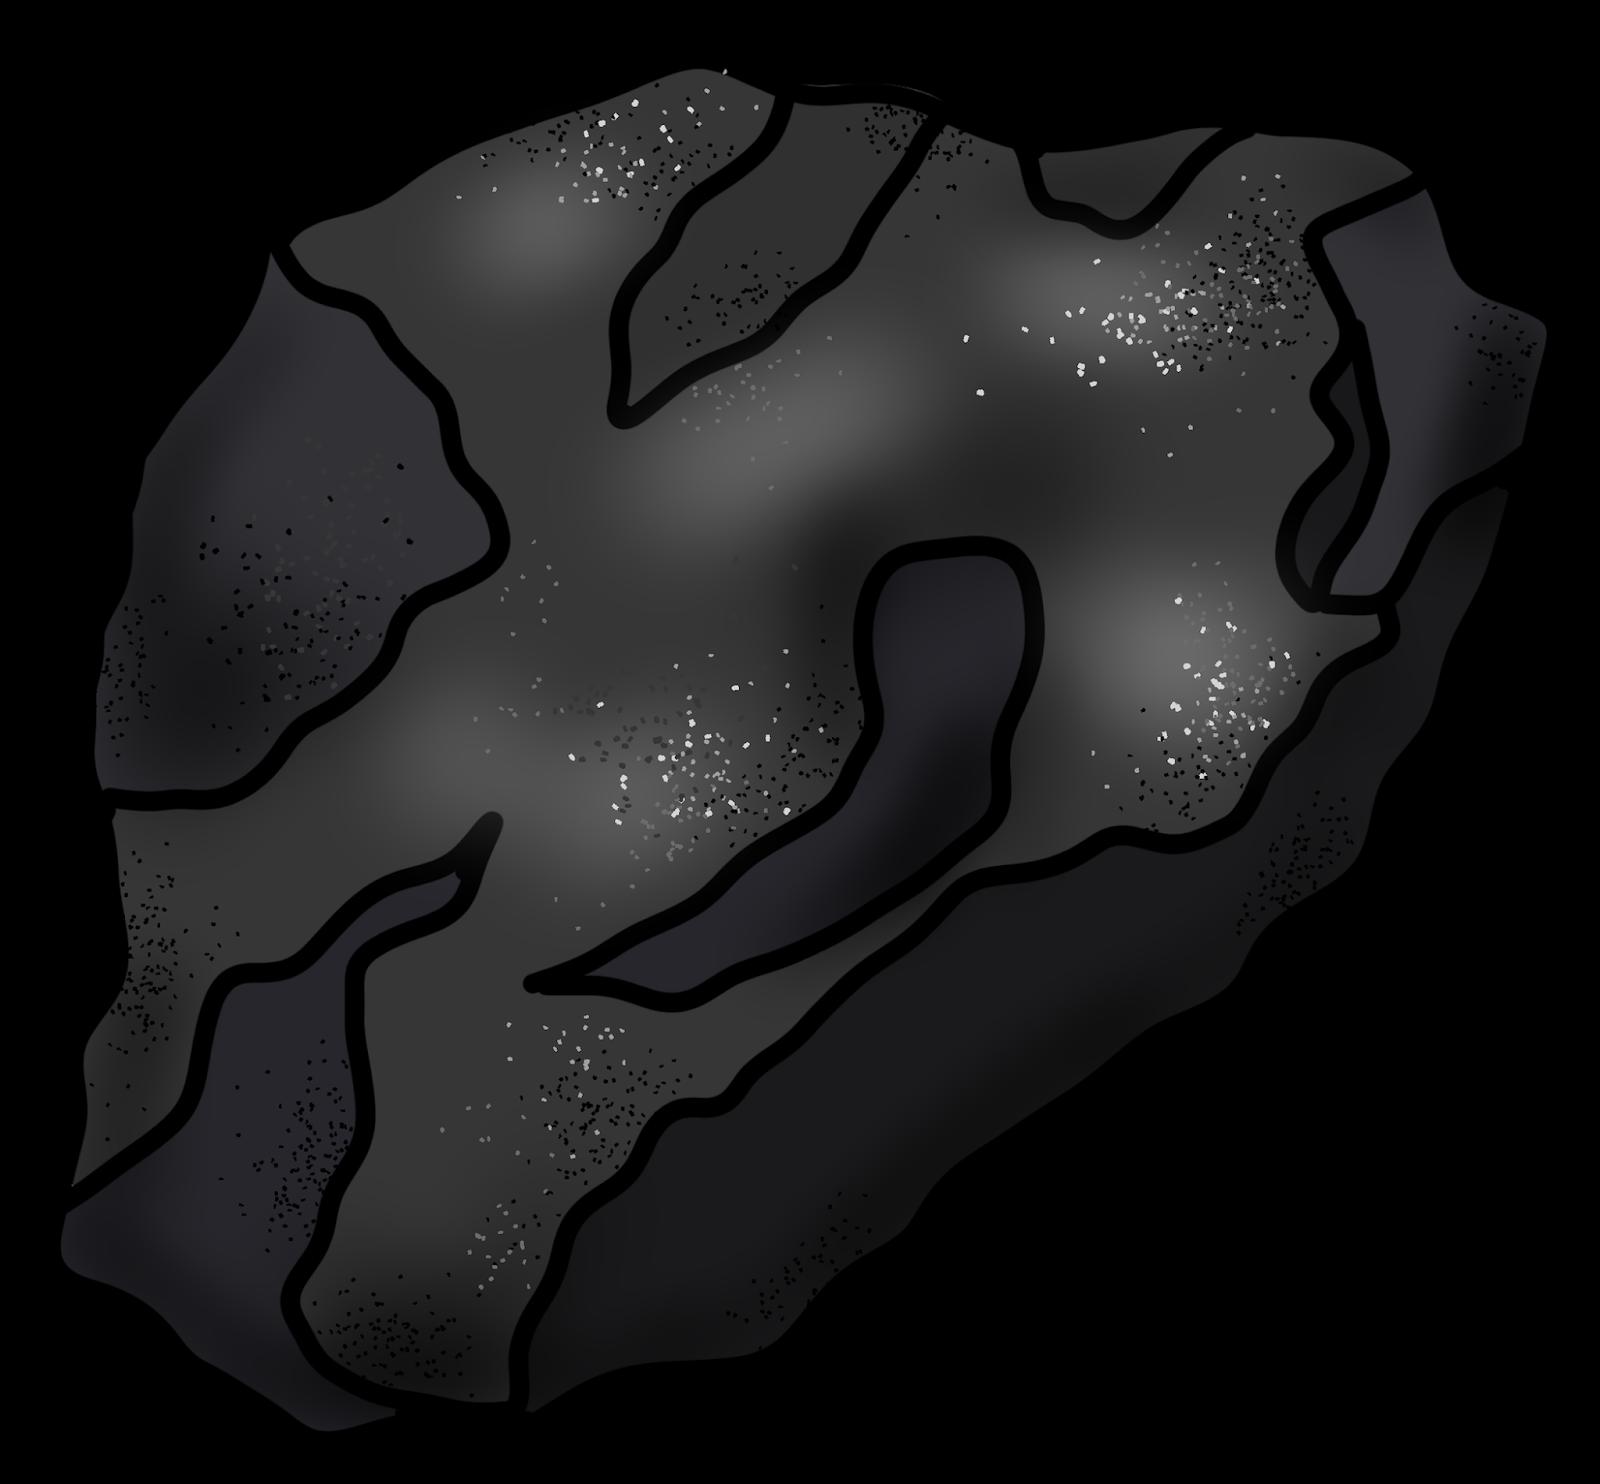 Dot clipart period mark. A lump of coal